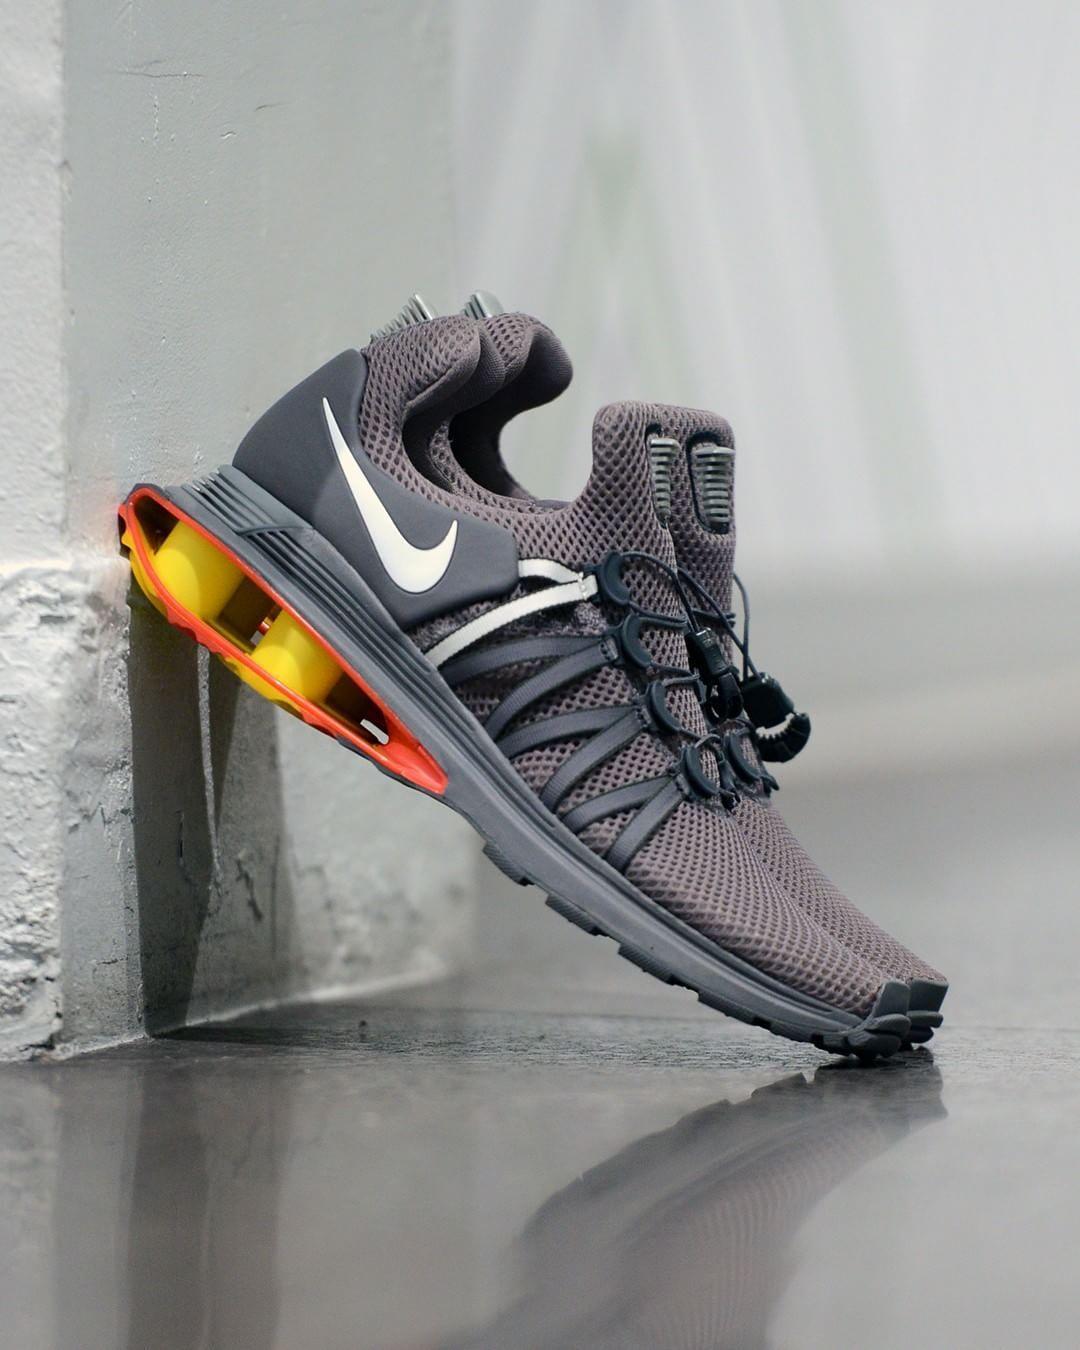 51f2a09d02f9 techwear - Nike Shox Gravity